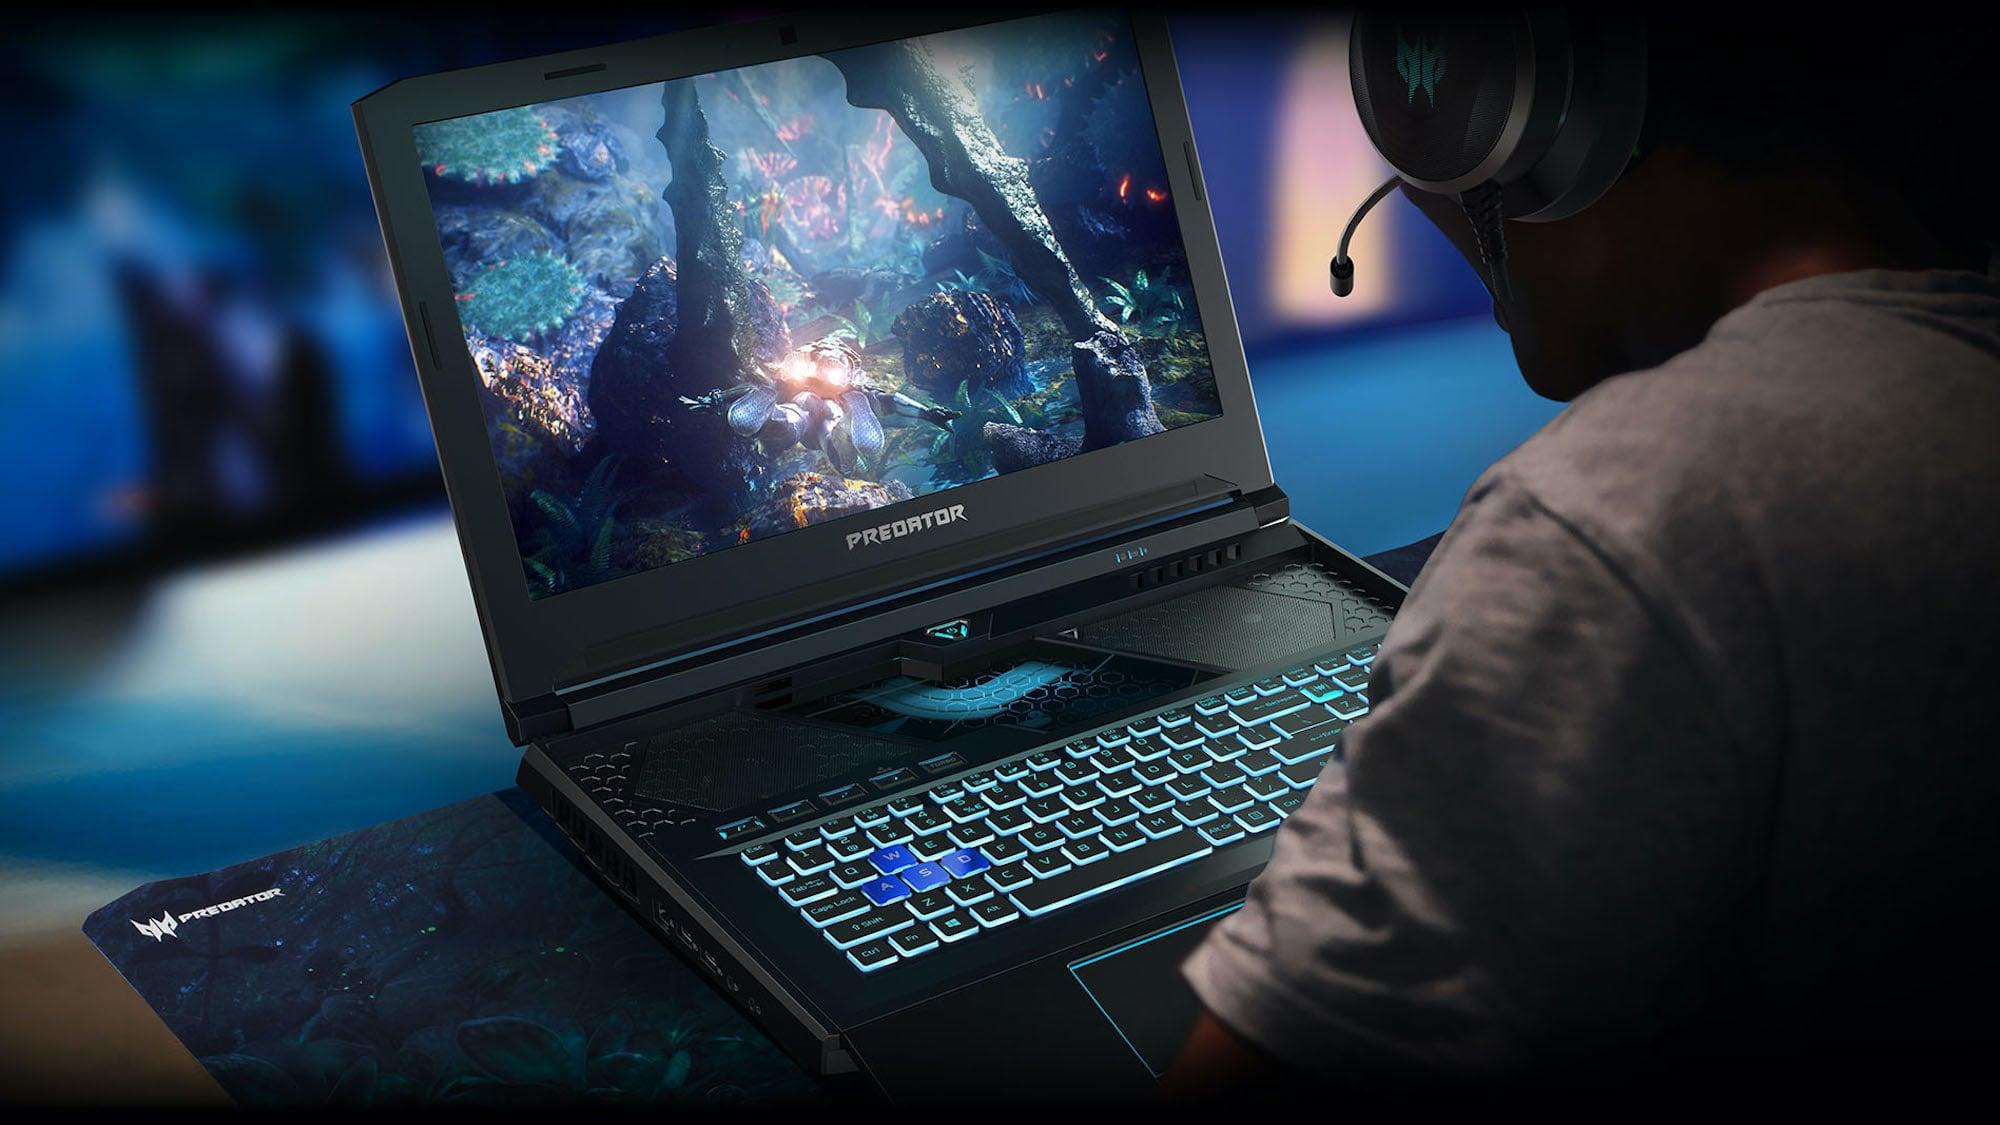 Acer Predator Helios 700 2020 Edition Gaming Laptop